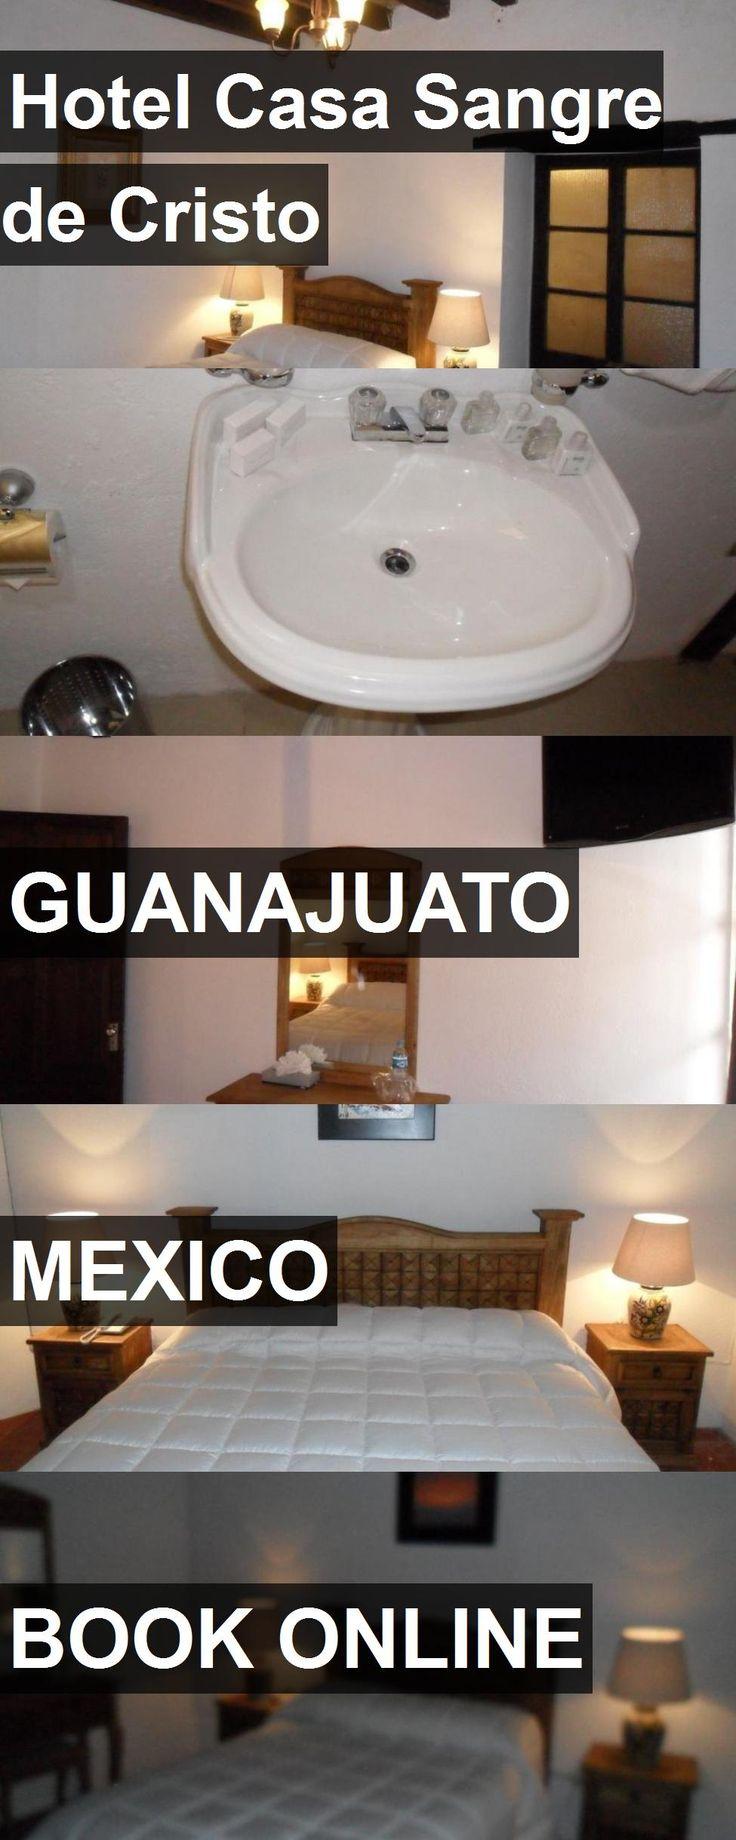 Hotel Hotel Casa Sangre de Cristo in Guanajuato, Mexico. For more information, photos, reviews and best prices please follow the link. #Mexico #Guanajuato #HotelCasaSangredeCristo #hotel #travel #vacation